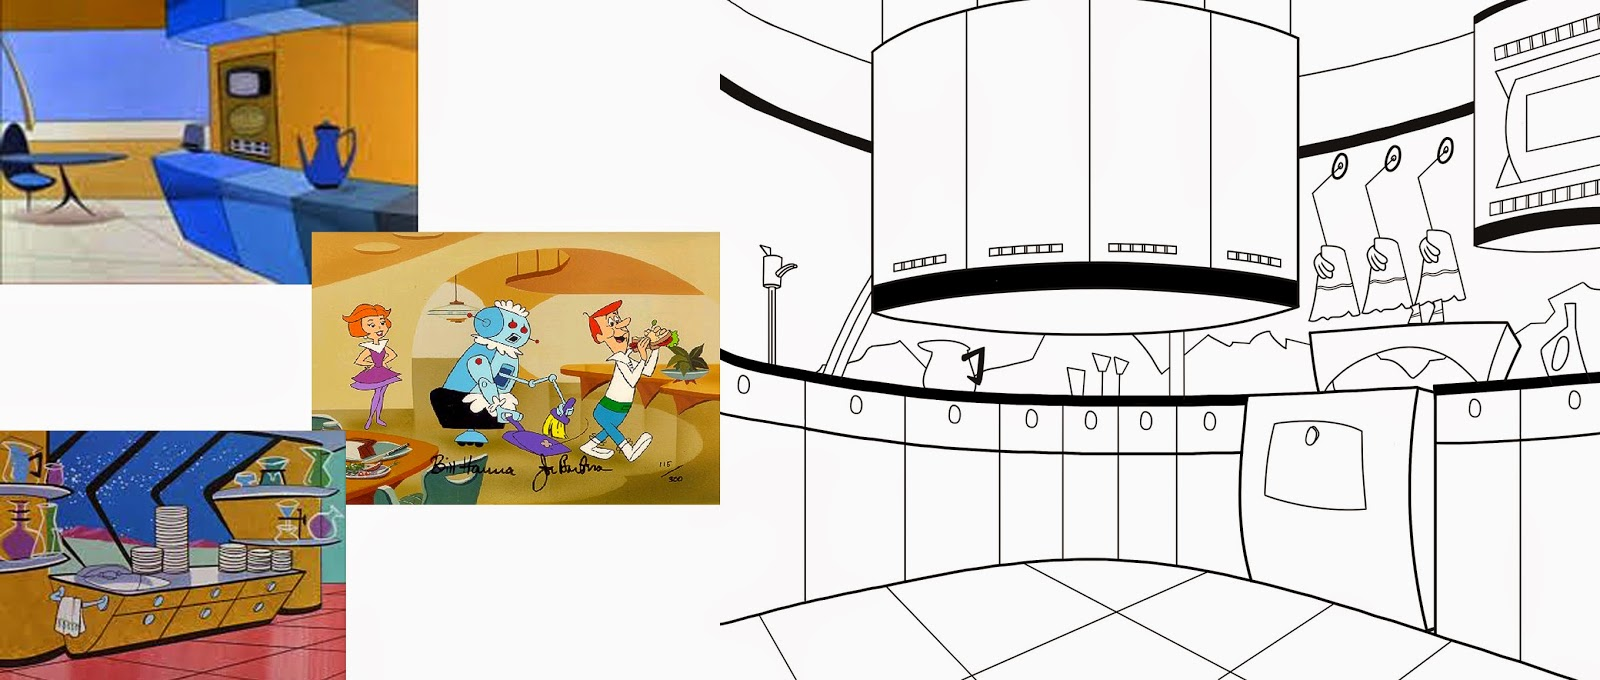 JC Animations and Illustrations: Futuristic Kitchen